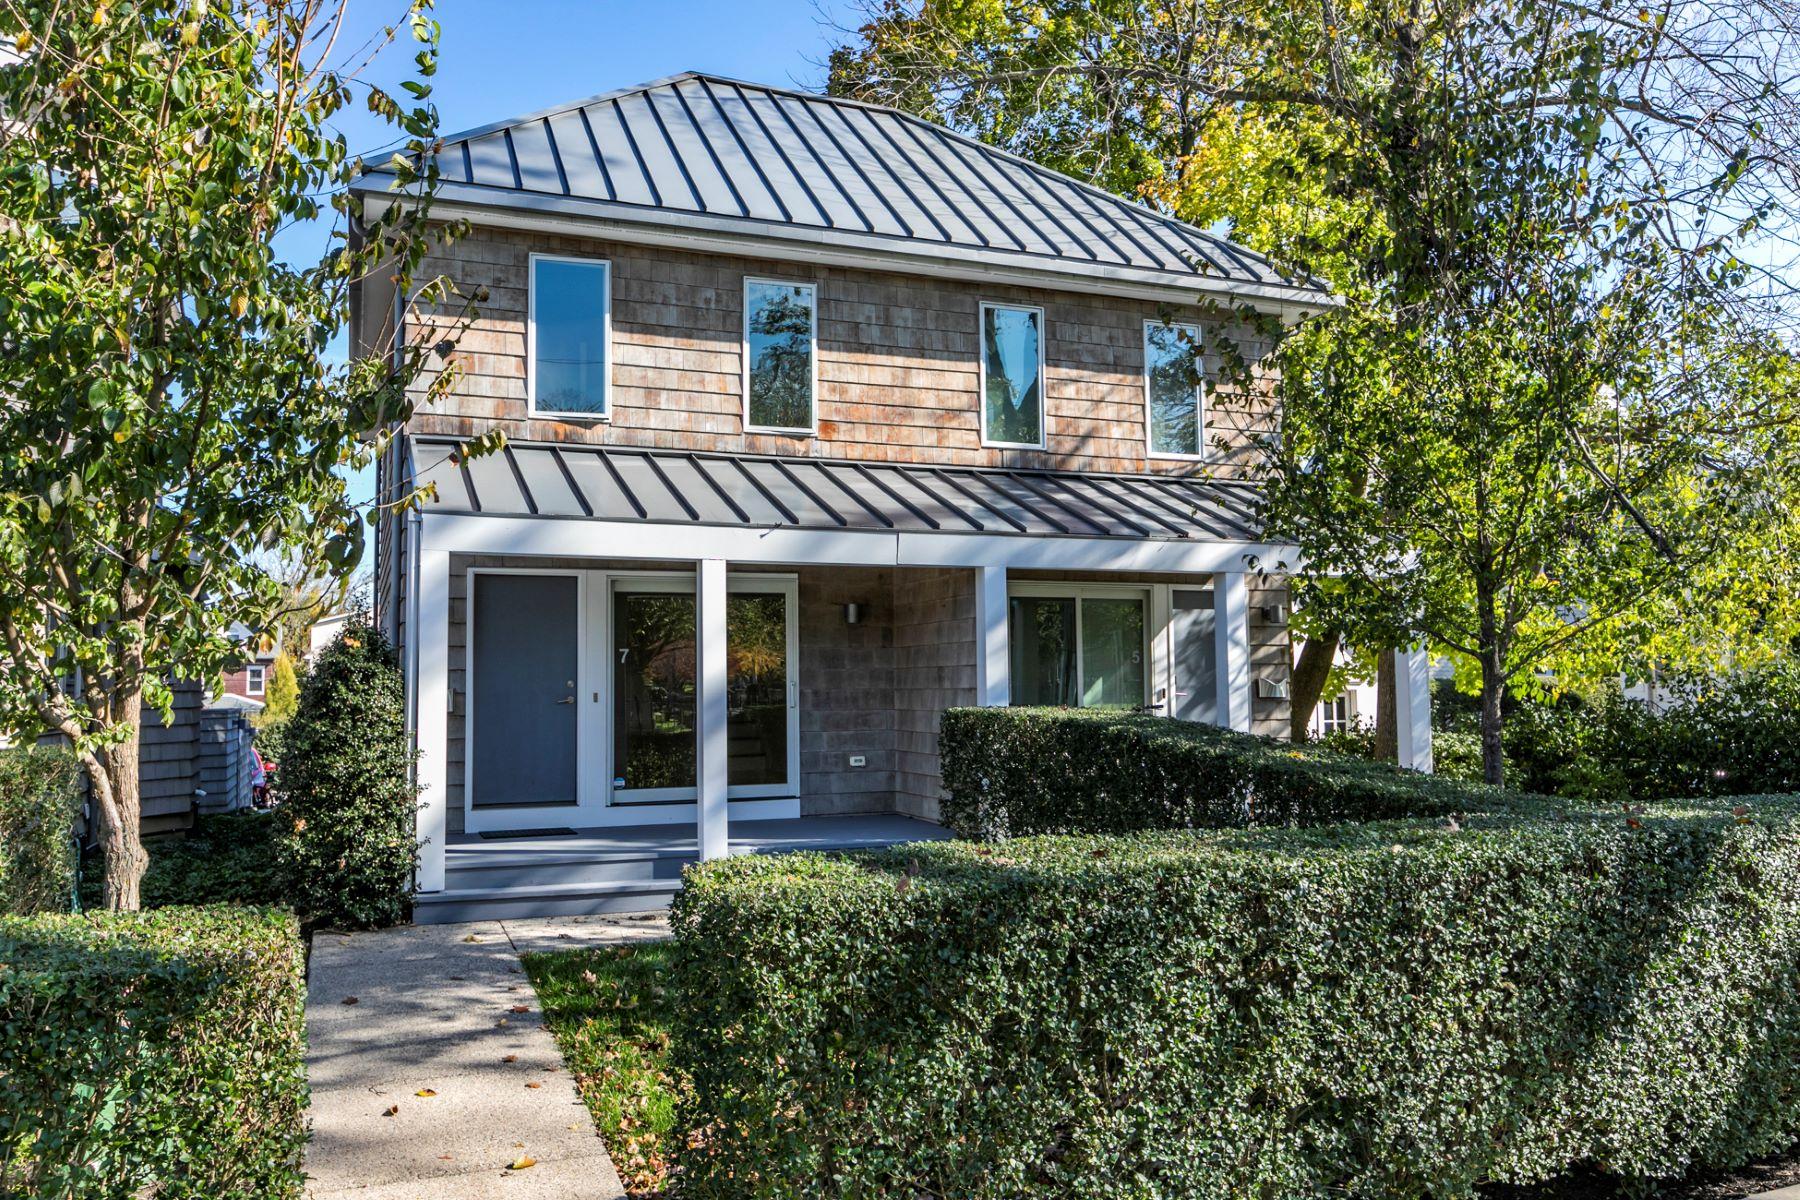 Condominiums vì Bán tại Sleek, Modern Hillier Condo in the Heart of Town 7 Greenview Avenue, Princeton, New Jersey 08542 Hoa Kỳ